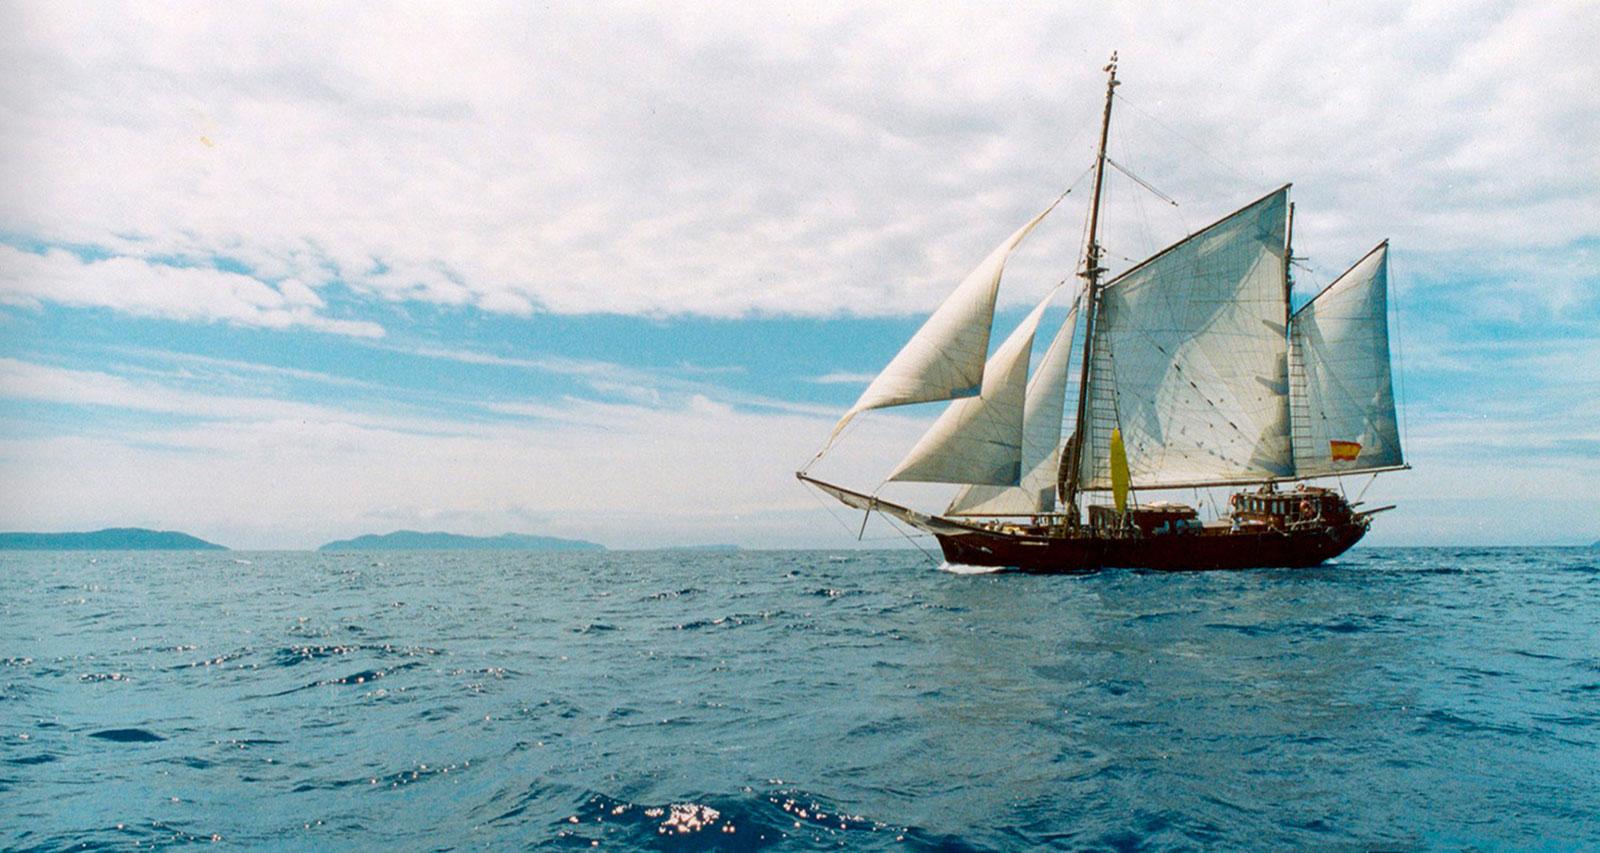 Mallorca-segelschiff-charter-mallorca-historisches-segelboot-mieten-mallorca-6